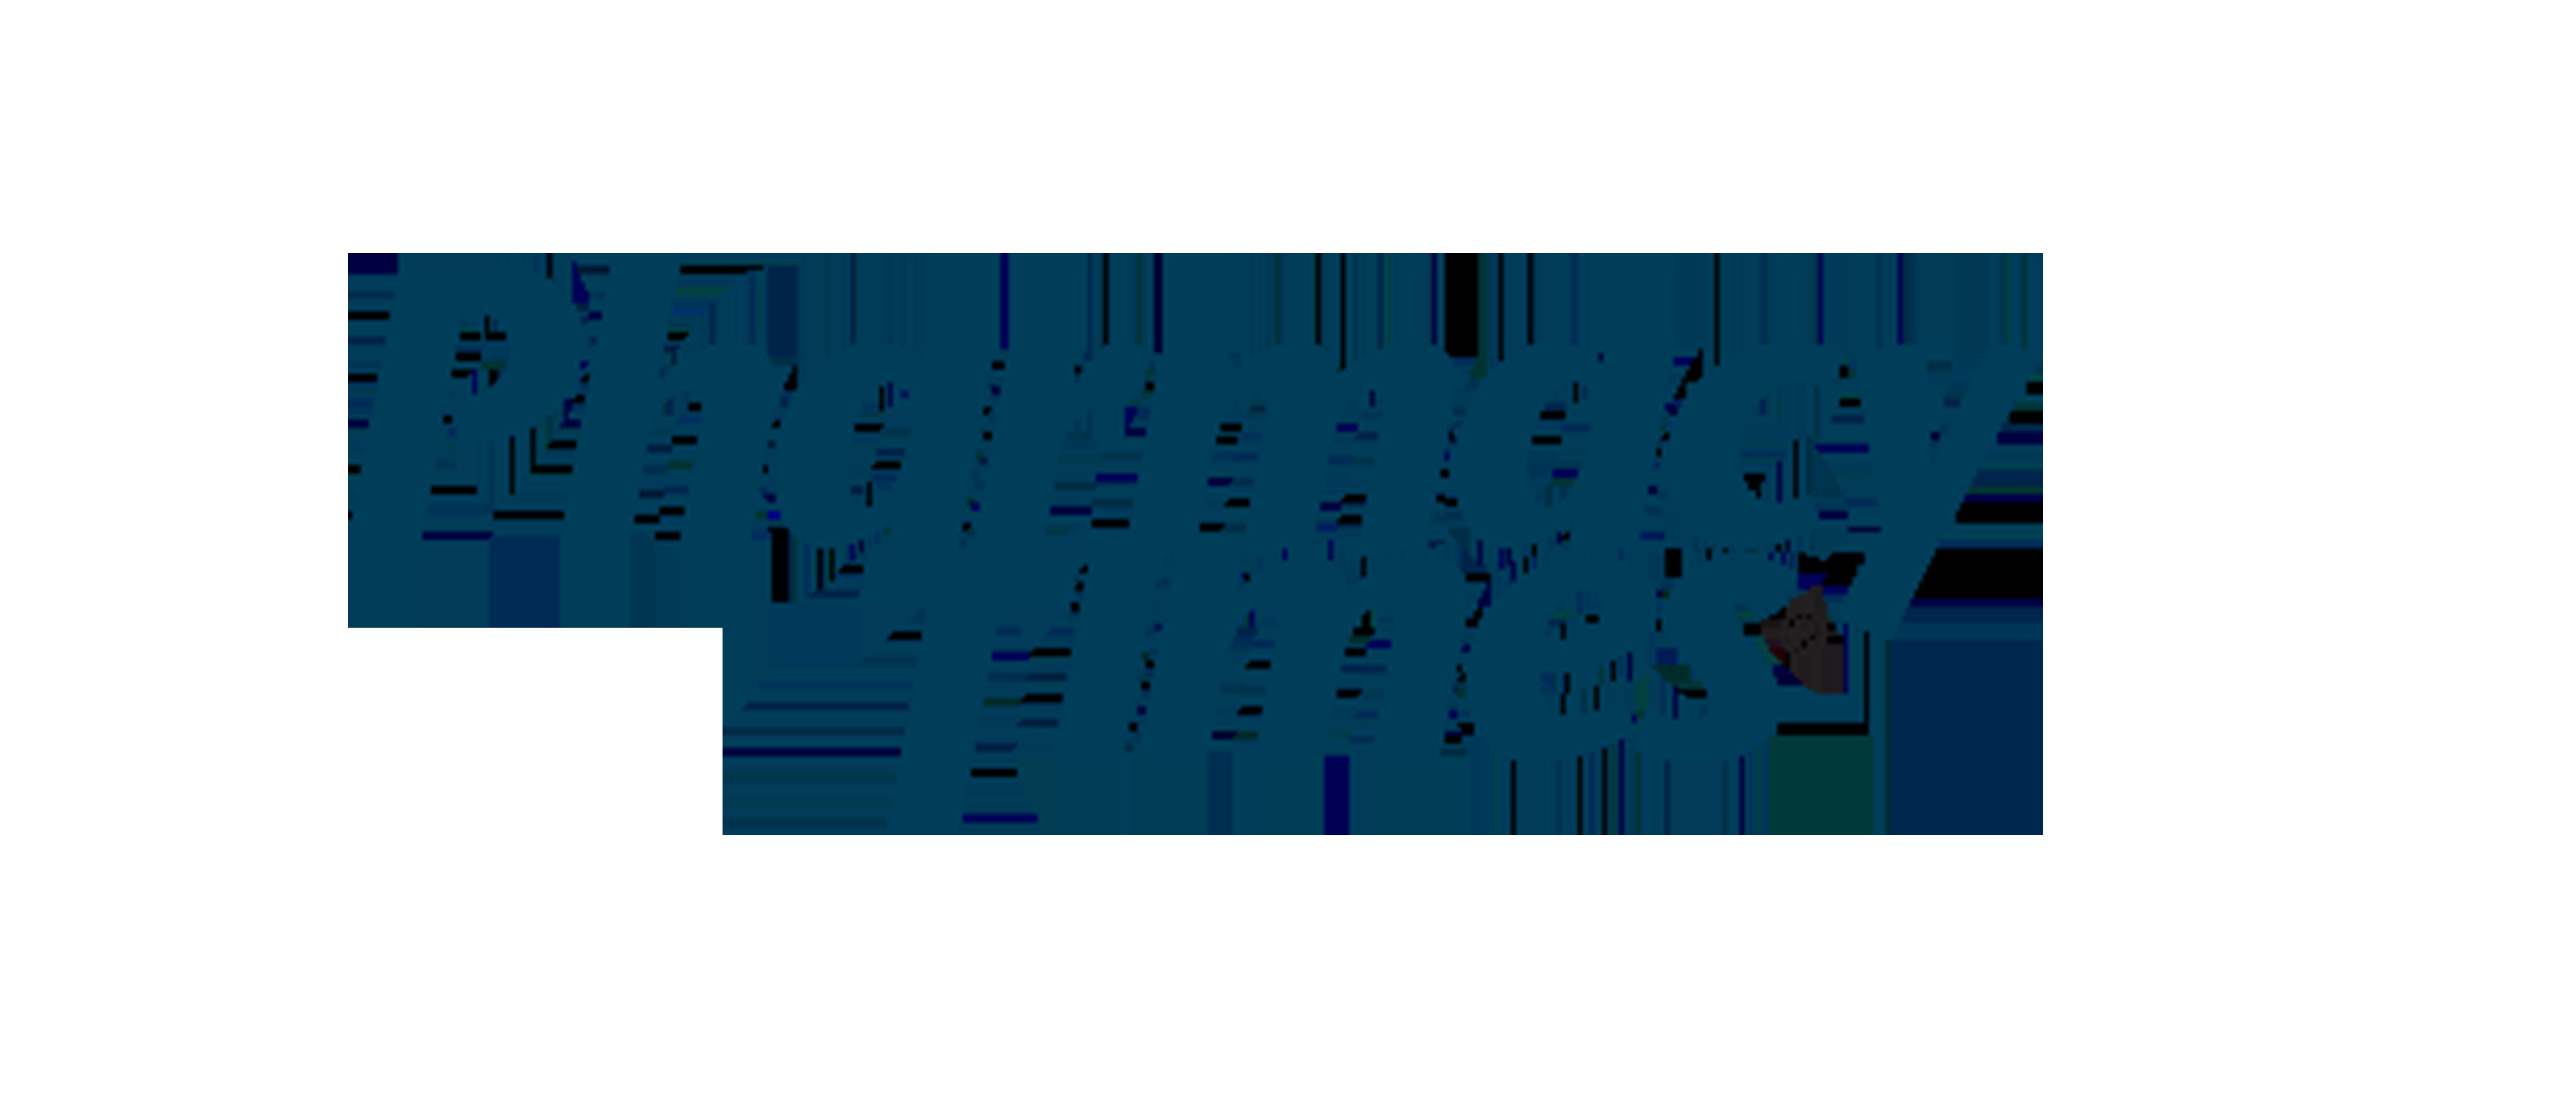 pharmacy-times-2